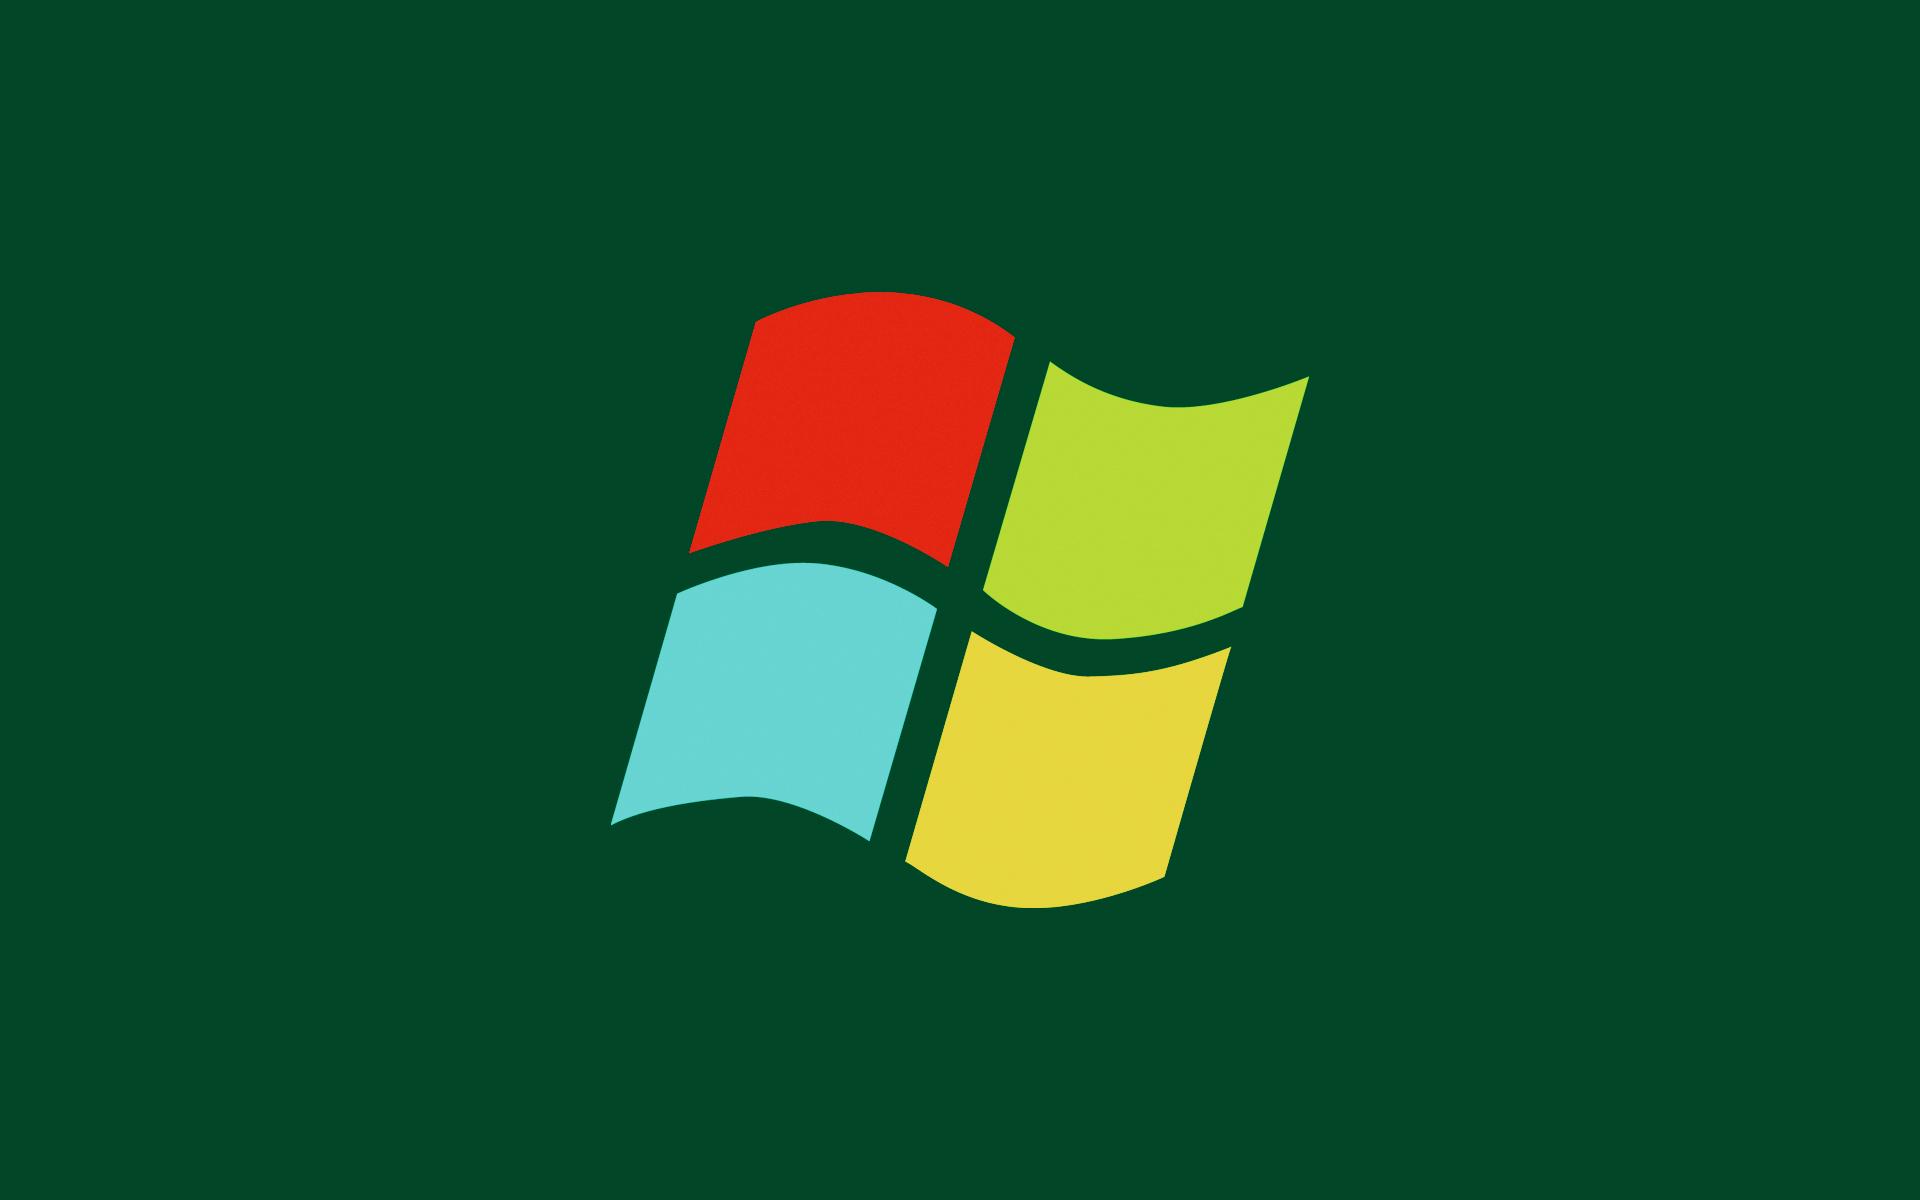 windows wallpapers logo wallpaper desktop 1920x1200 1920x1200